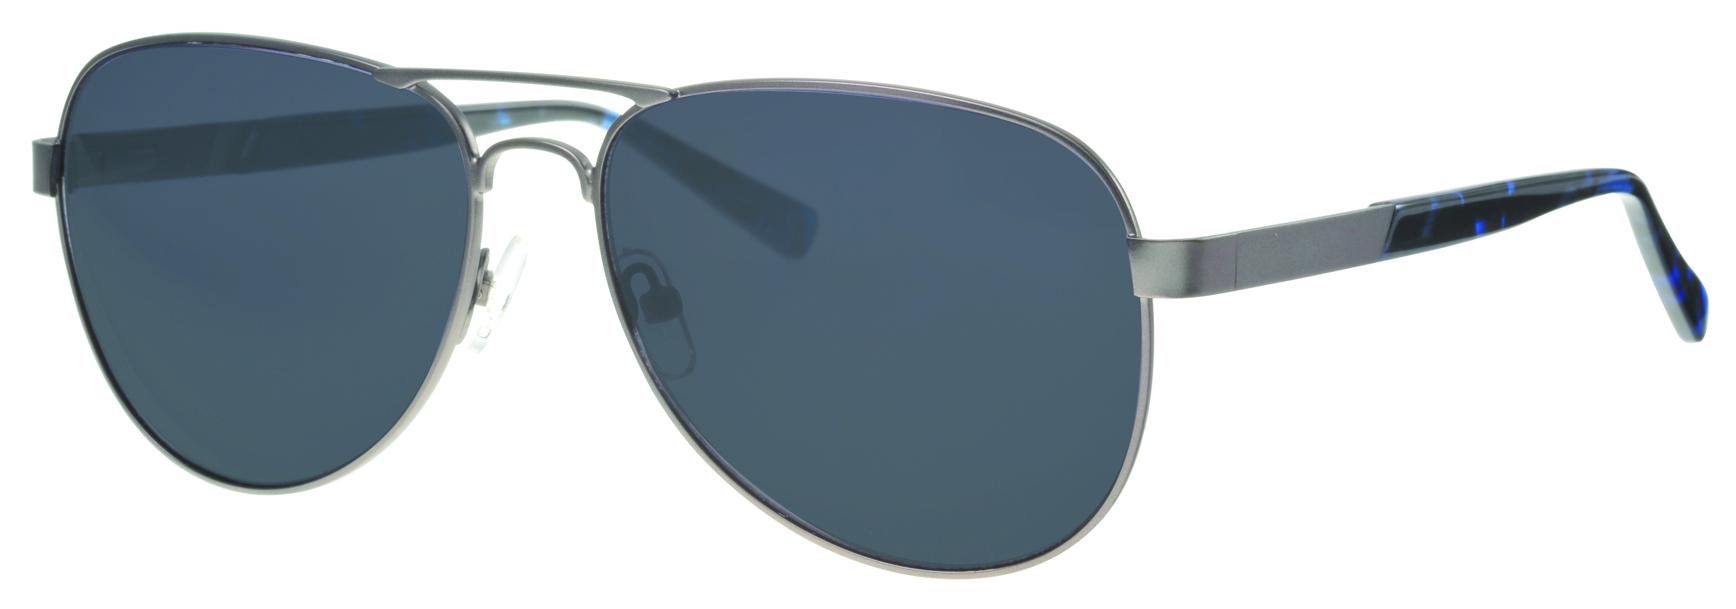 Aviator prescription sunglasses ilkeston